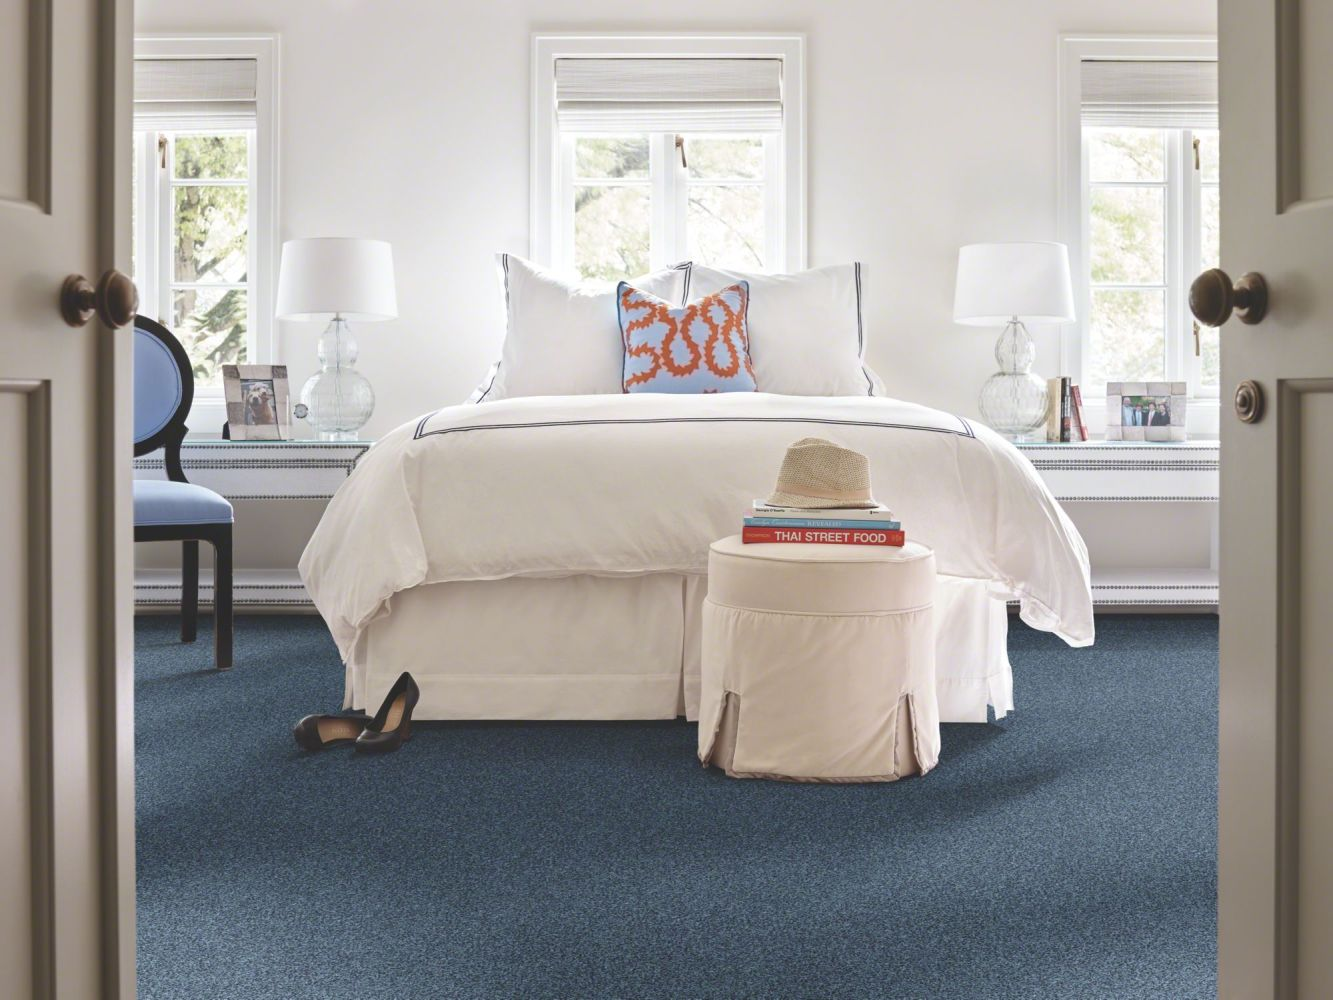 Shaw Floors Simply The Best Wild Extract Indigo Mood E9351_00421